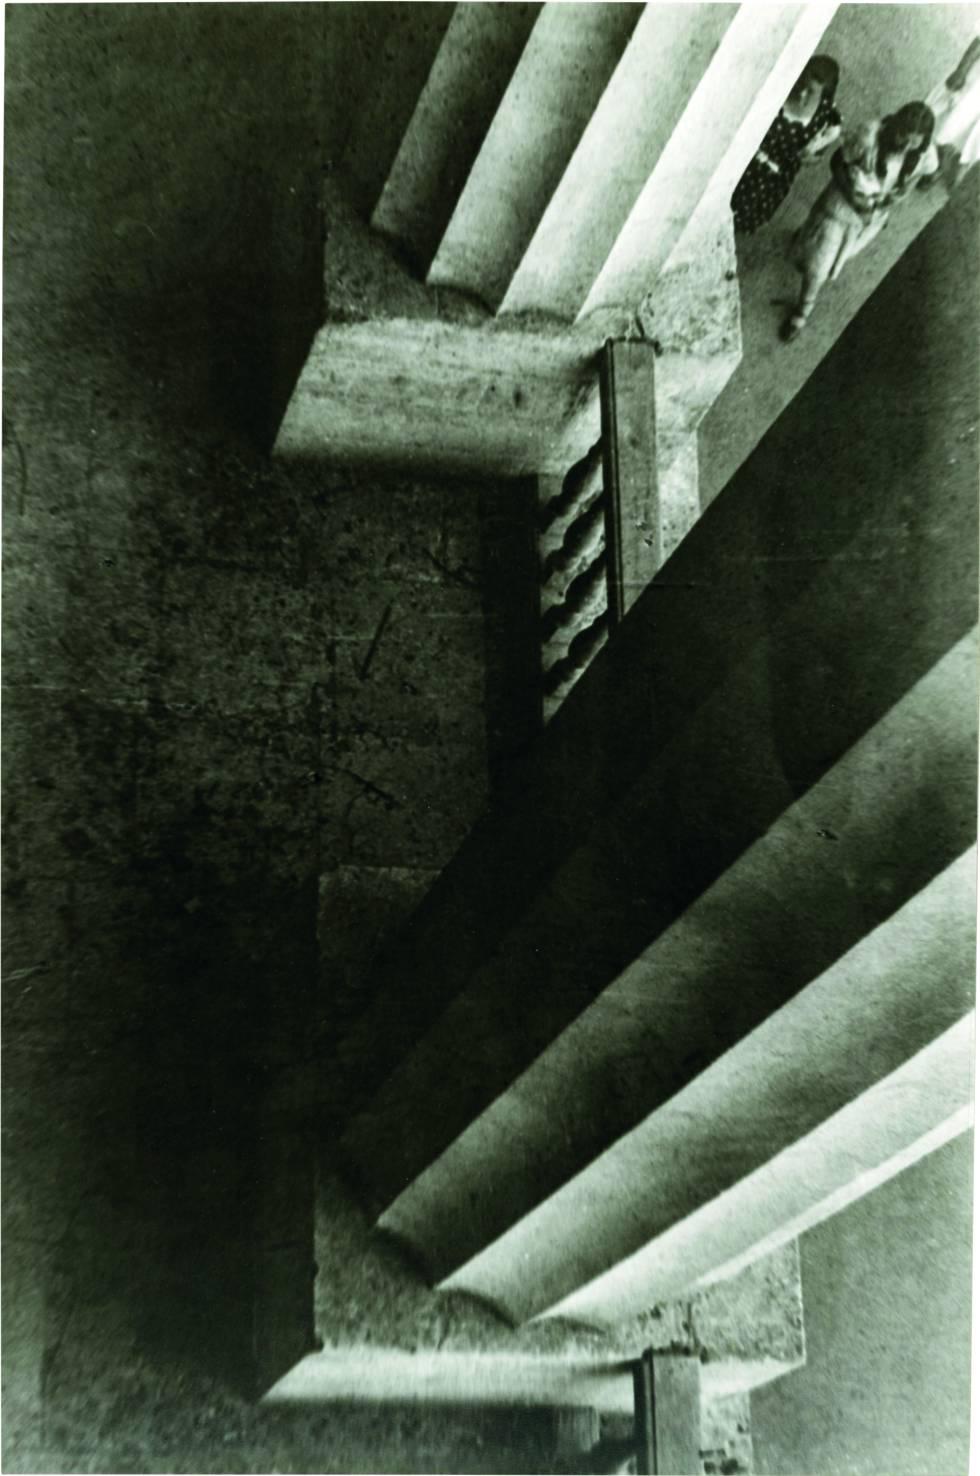 Rodchenko: mirando al mundo desde otro ángulo